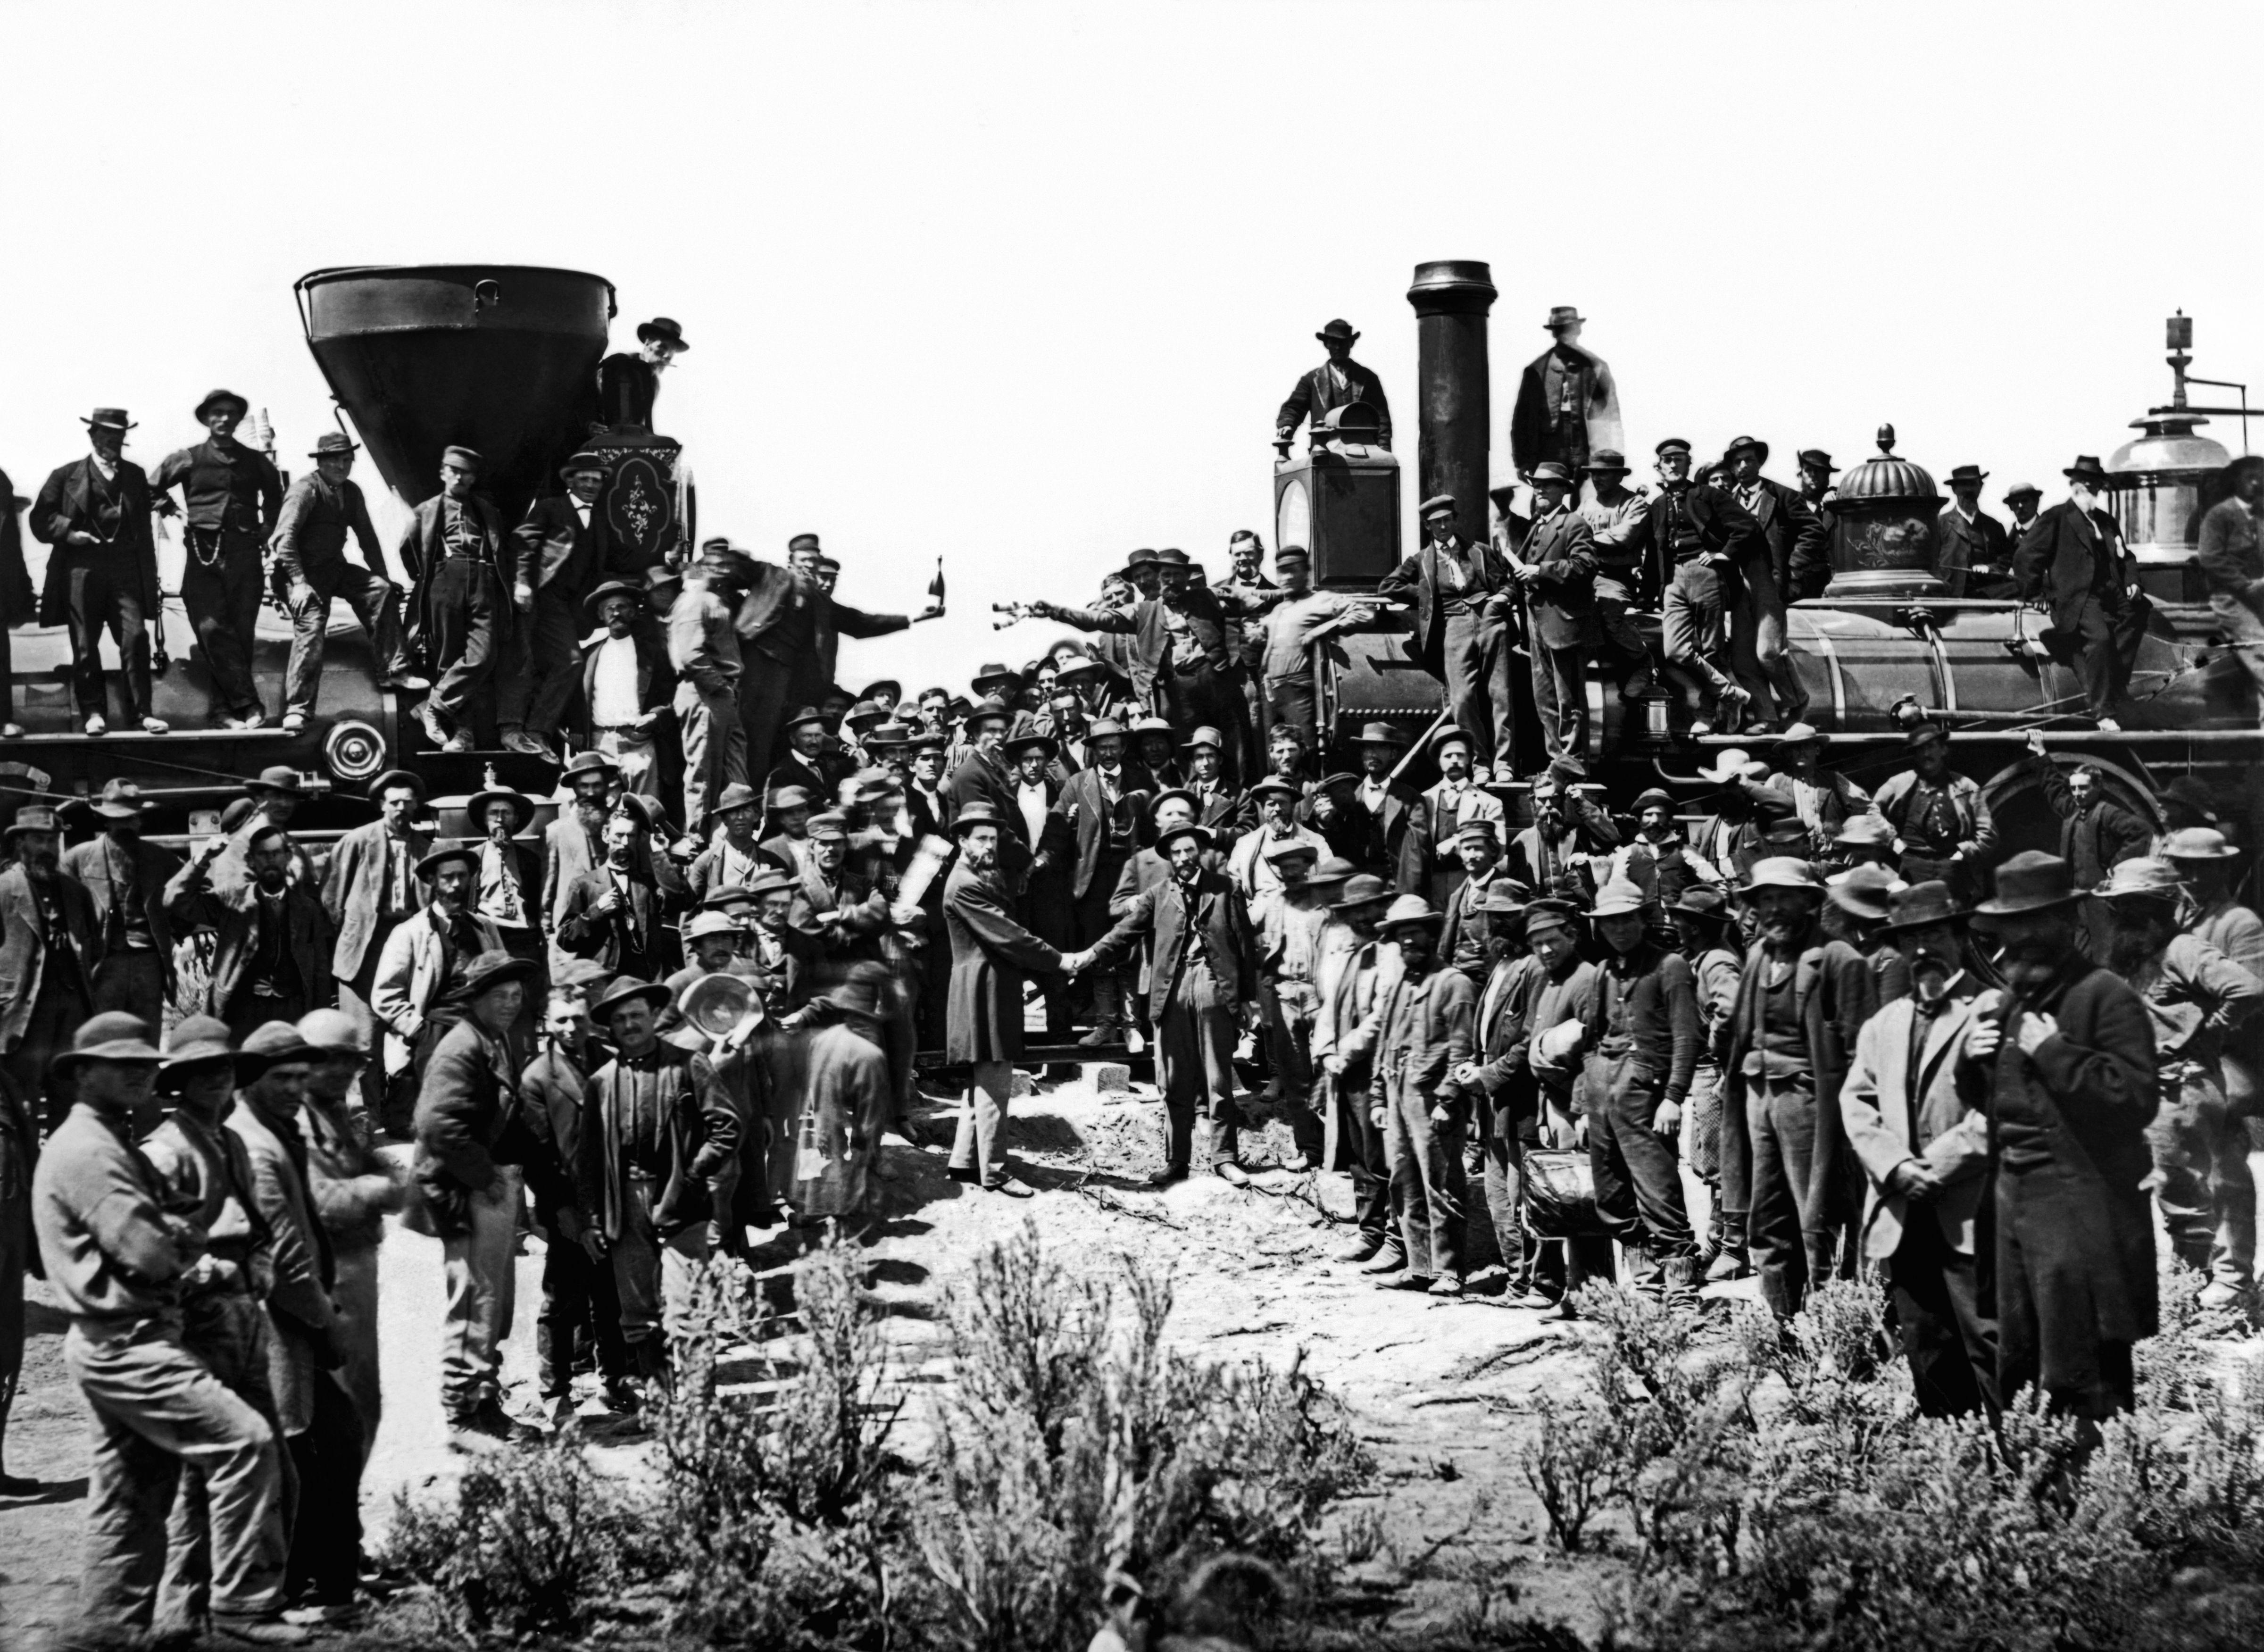 Crowd gathered around two locomotives.